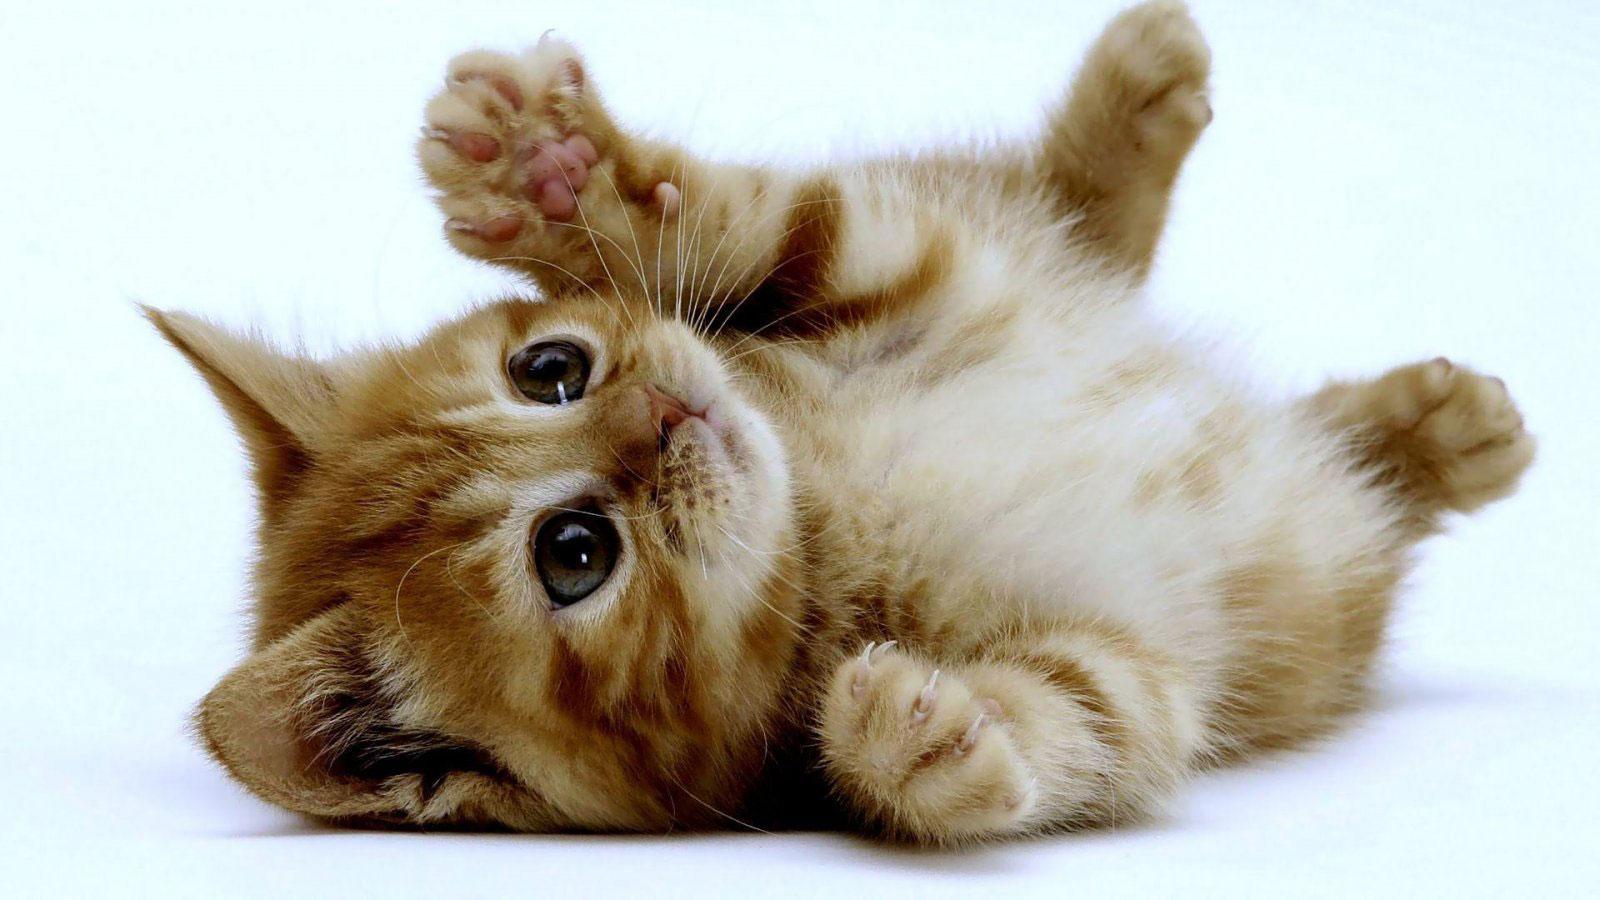 fisioterapia animales pequeños